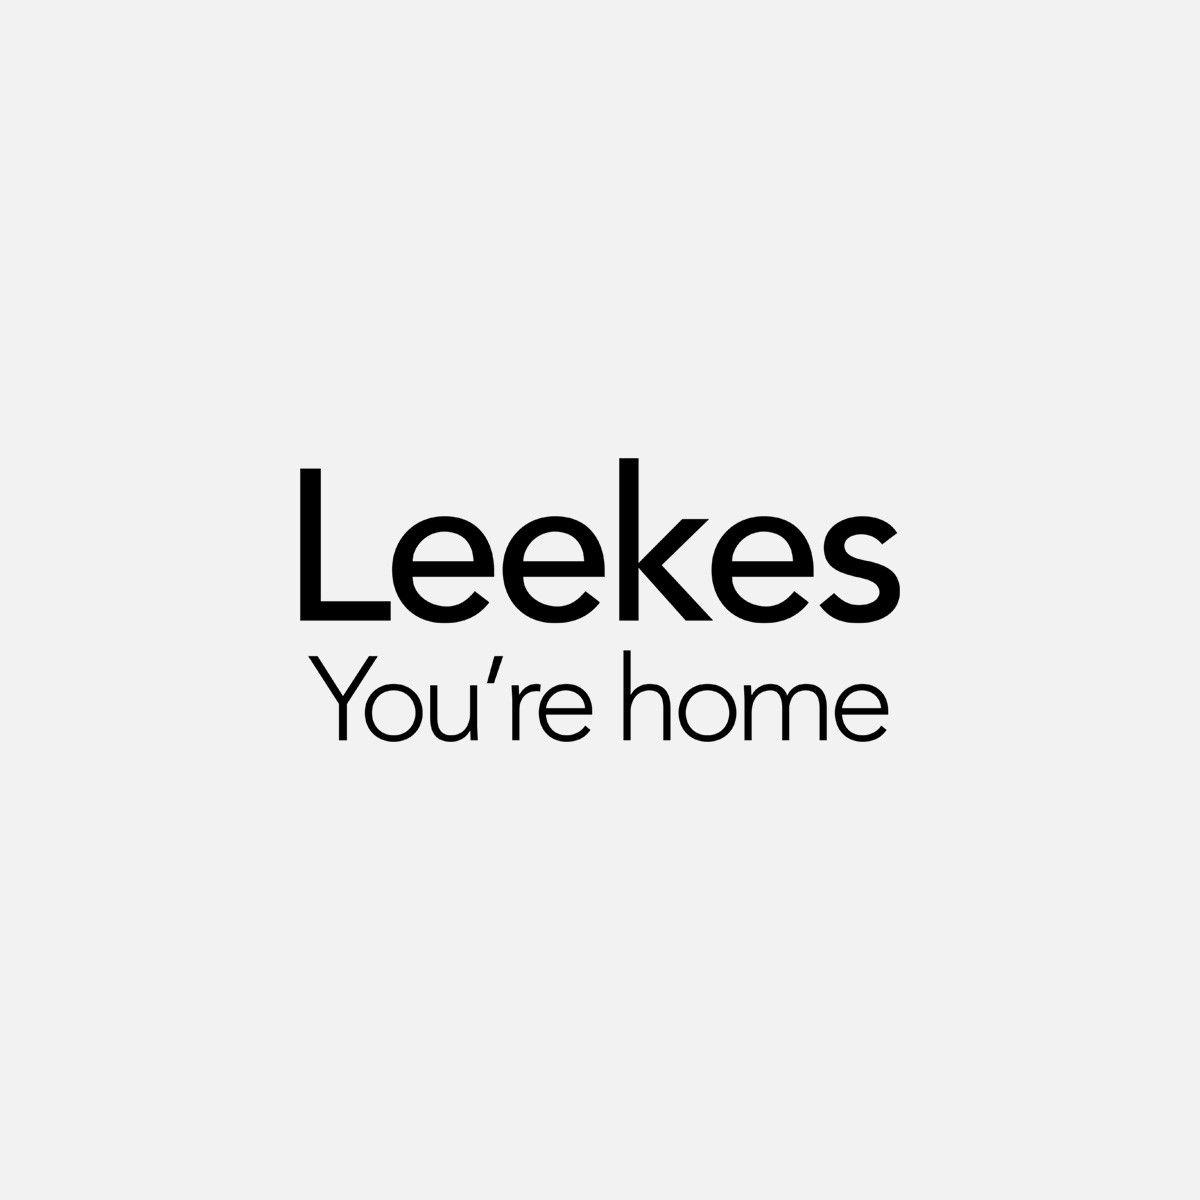 hton noir glass frame 5x7 leekes